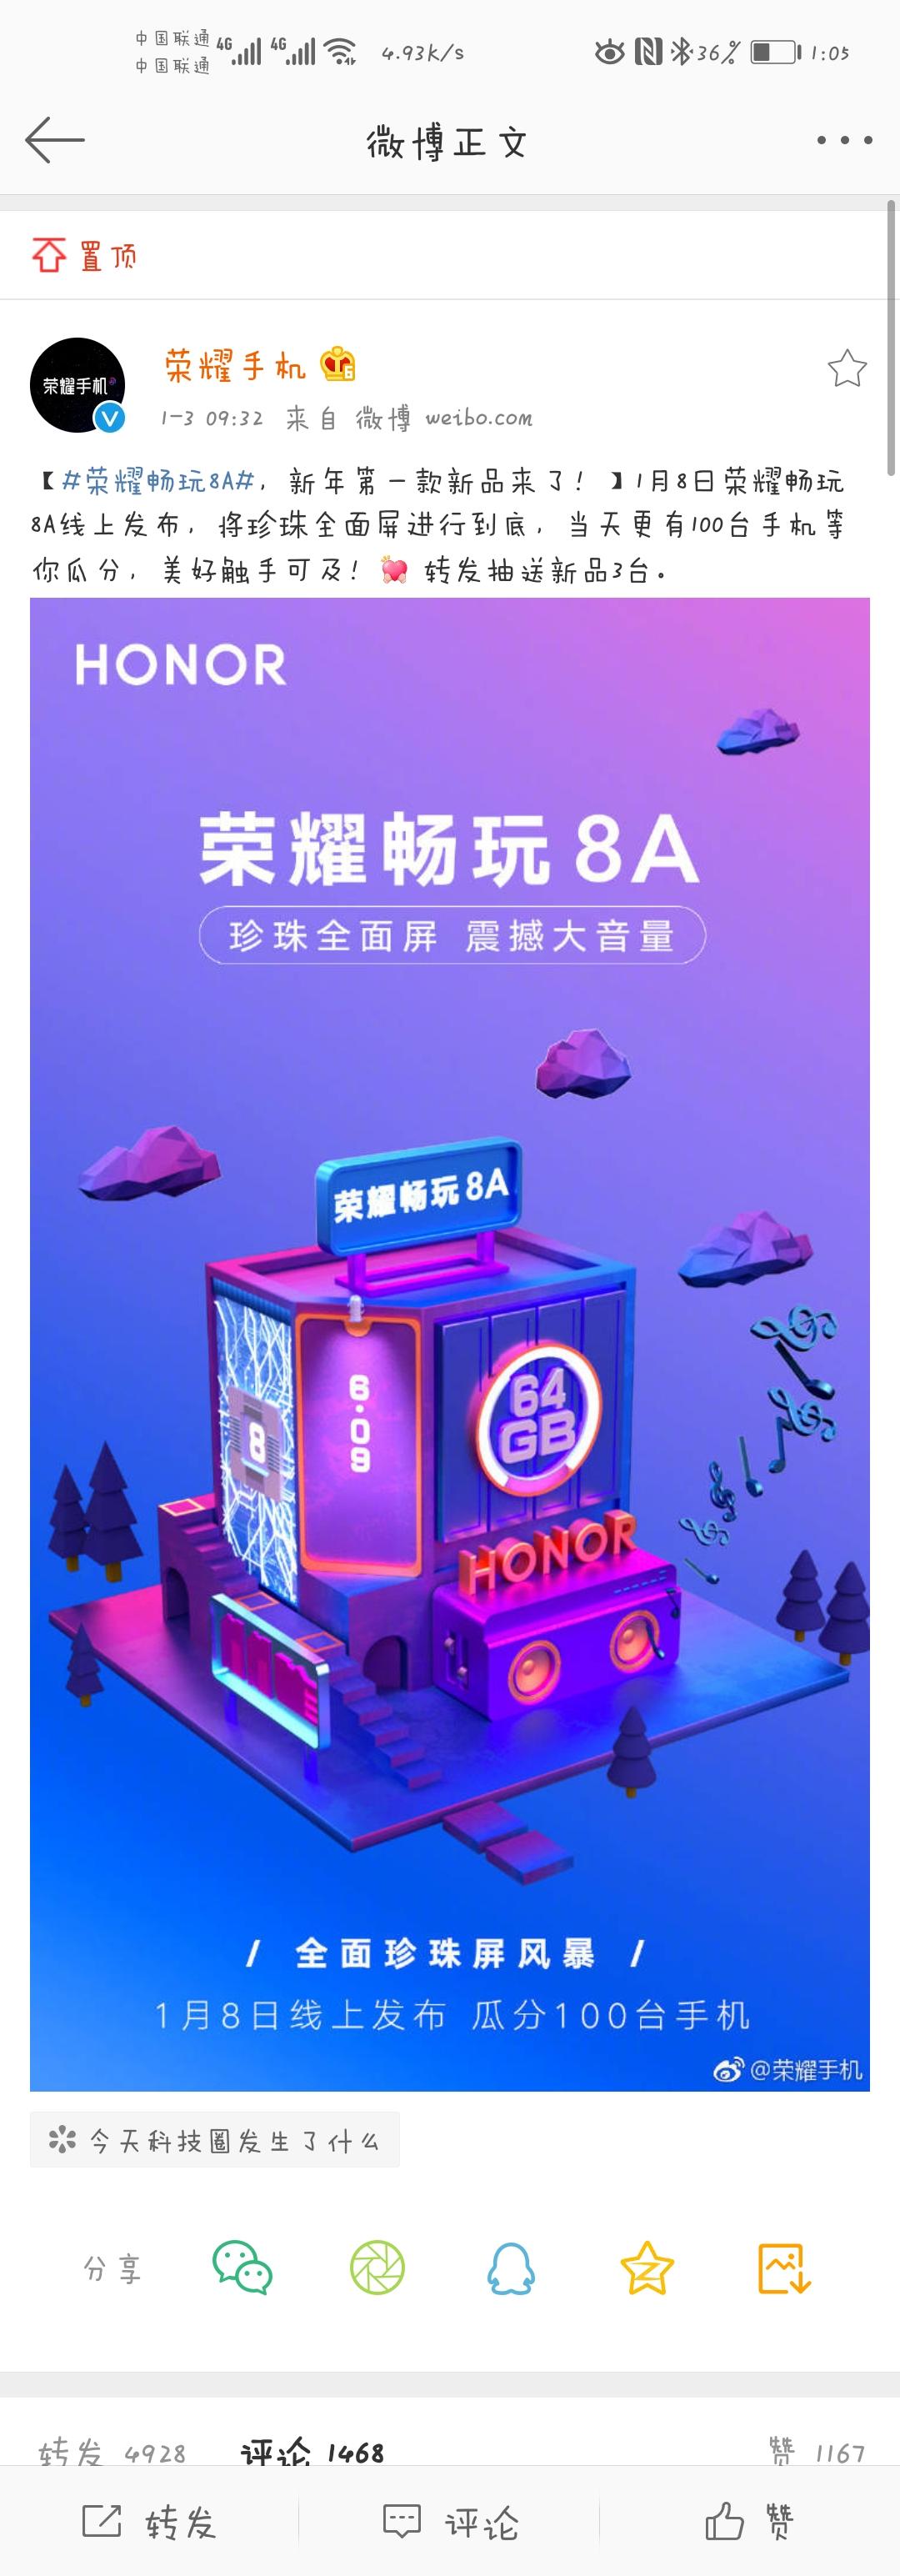 Screenshot_20190107_010556_com.sina.weibo.jpg